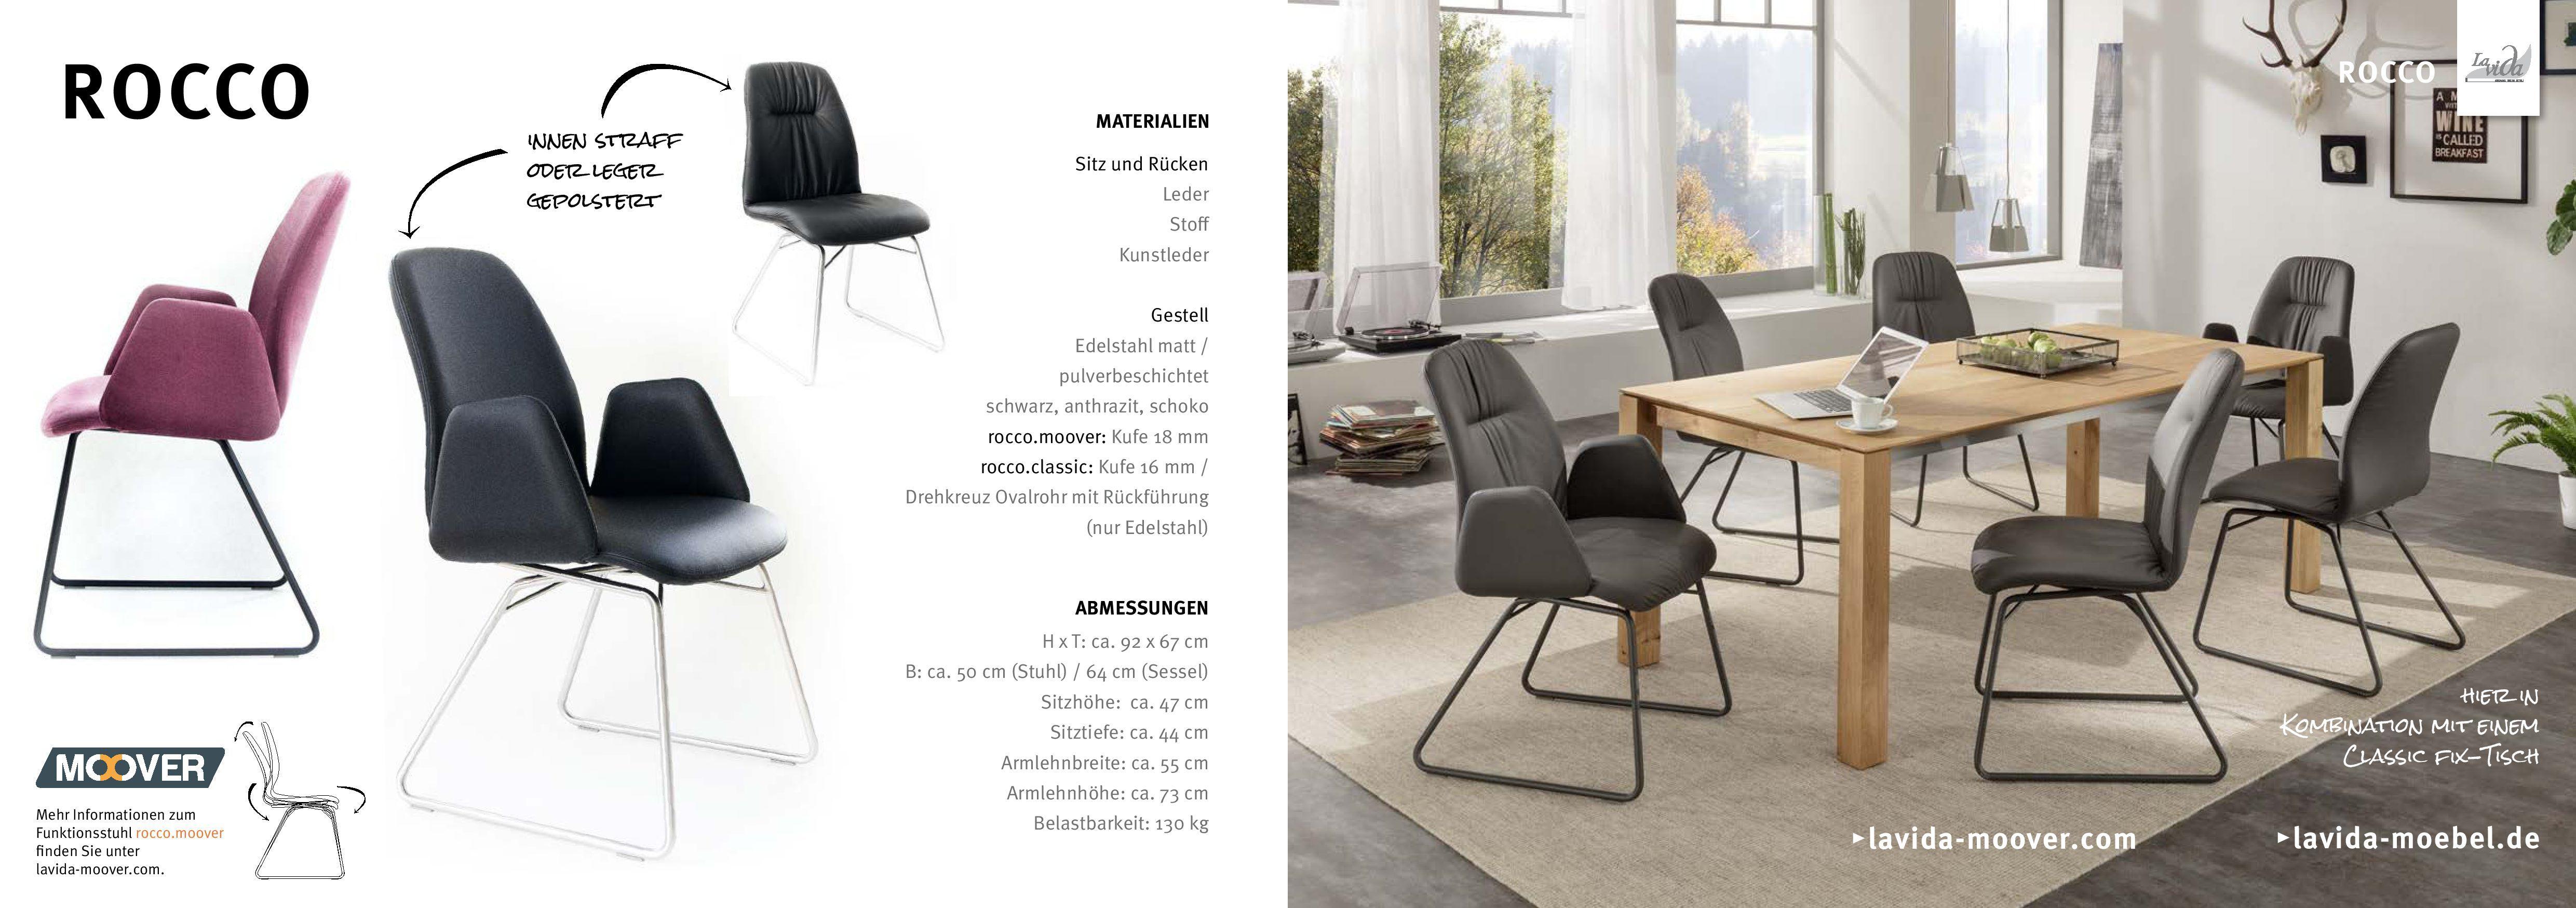 La Vida Stuhl Rocco Designermobel Von Raum Form Stuhle Freischwinger Design